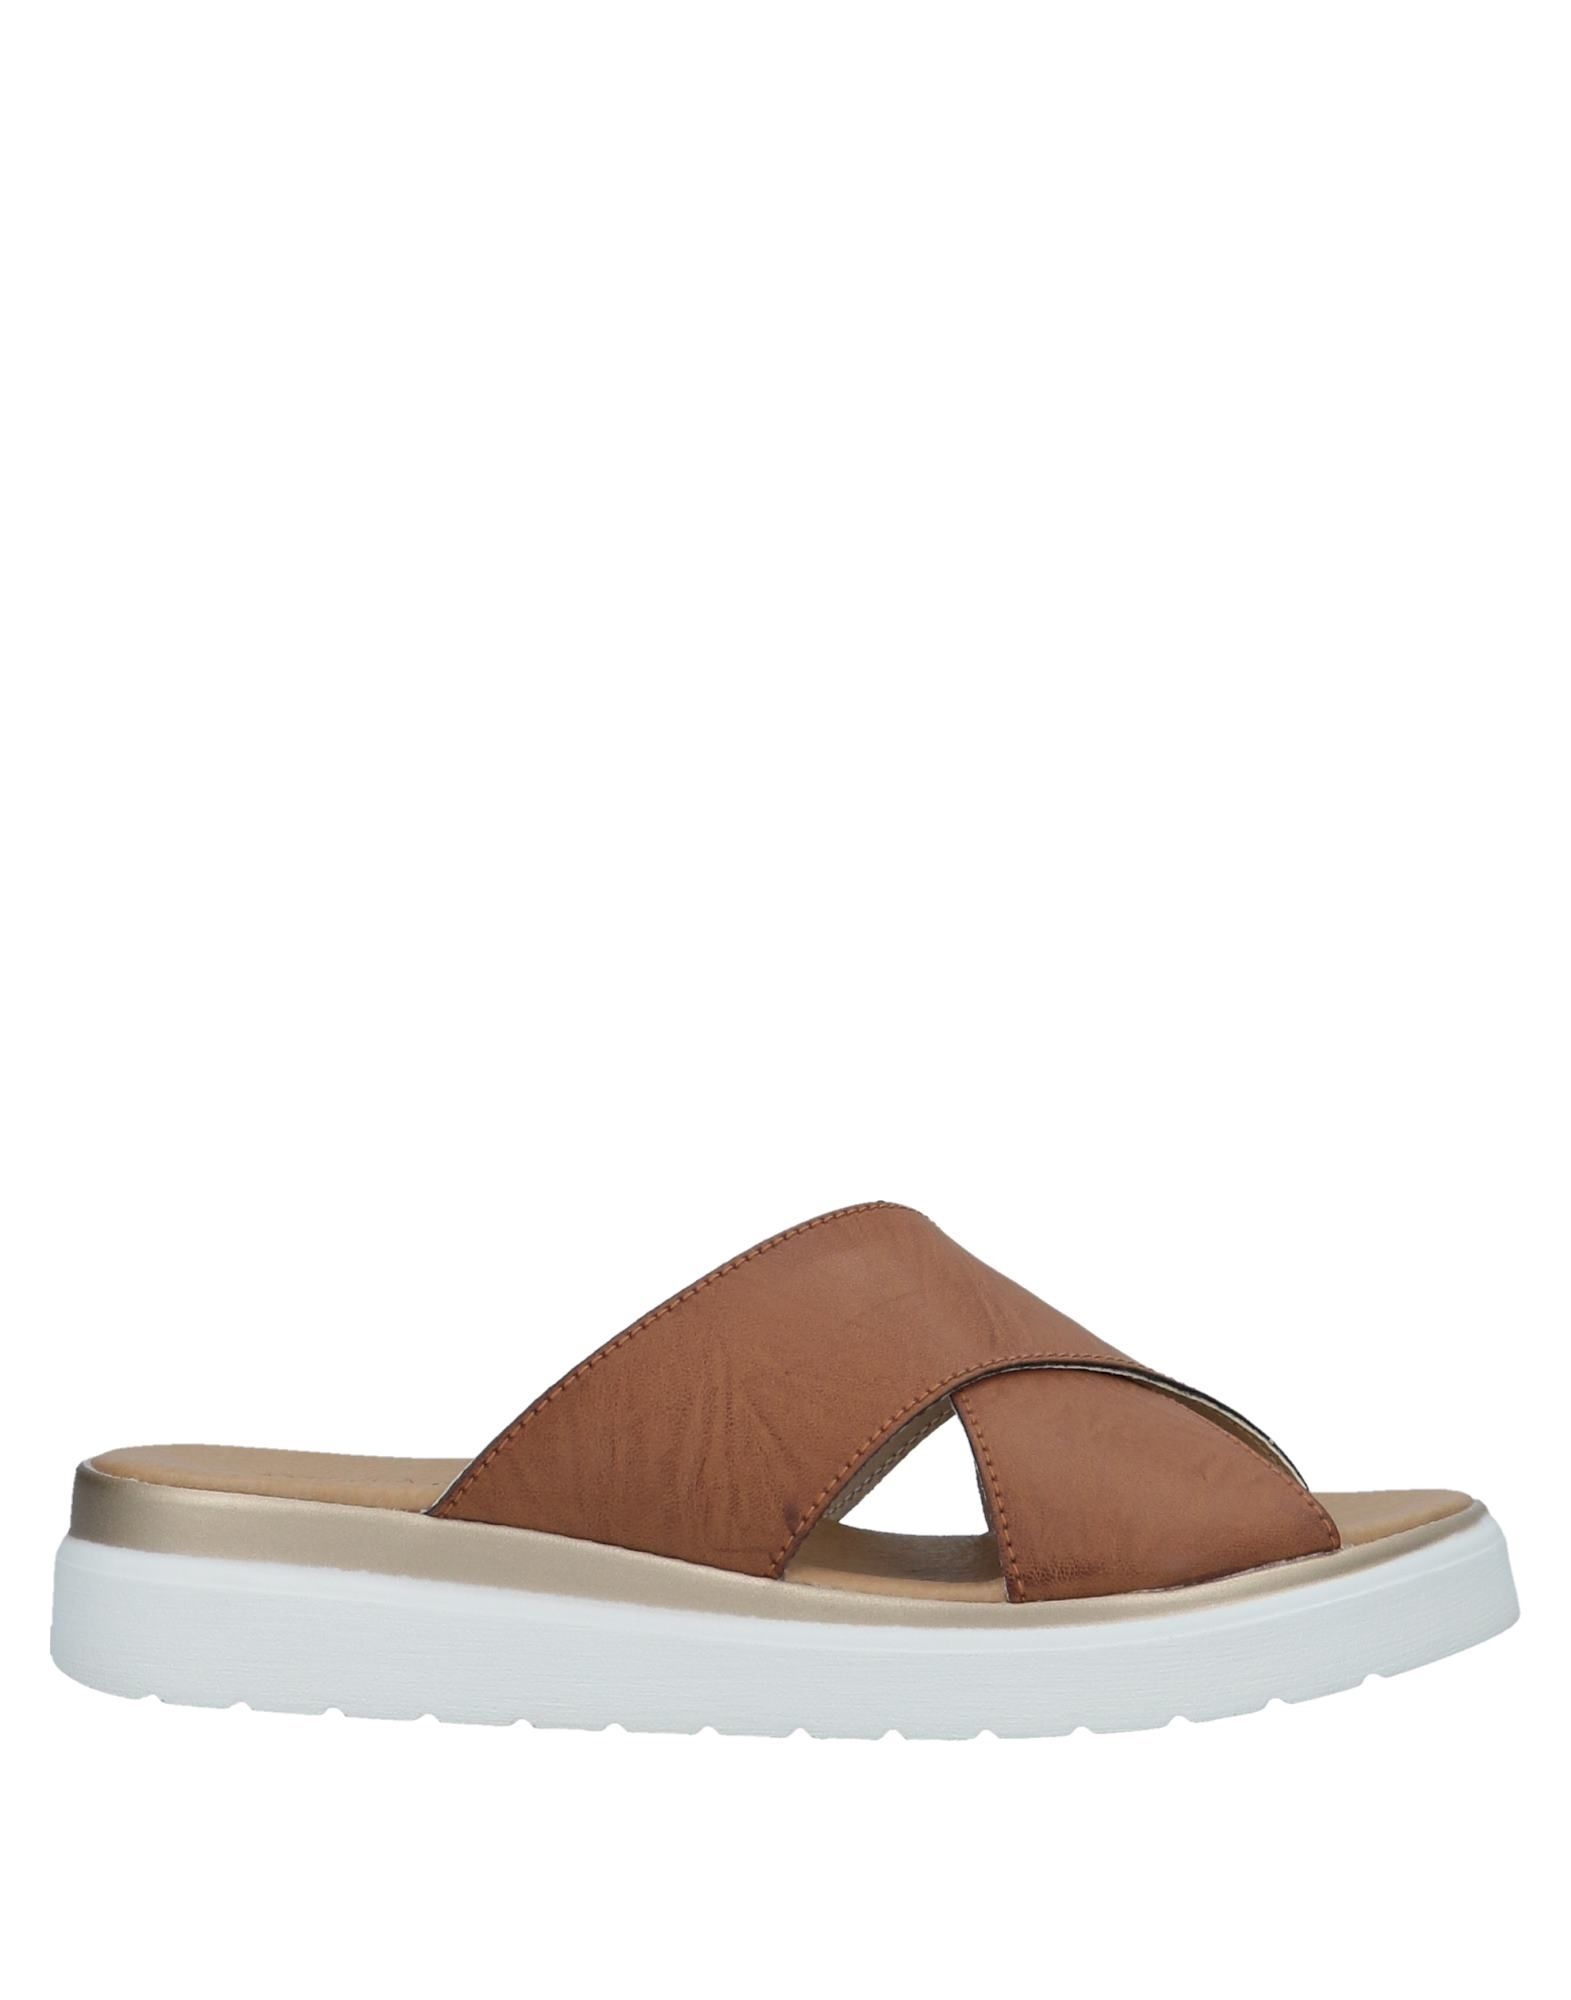 Angela George Sandalen beliebte Damen 11536350DO Gute Qualität beliebte Sandalen Schuhe 457ba8